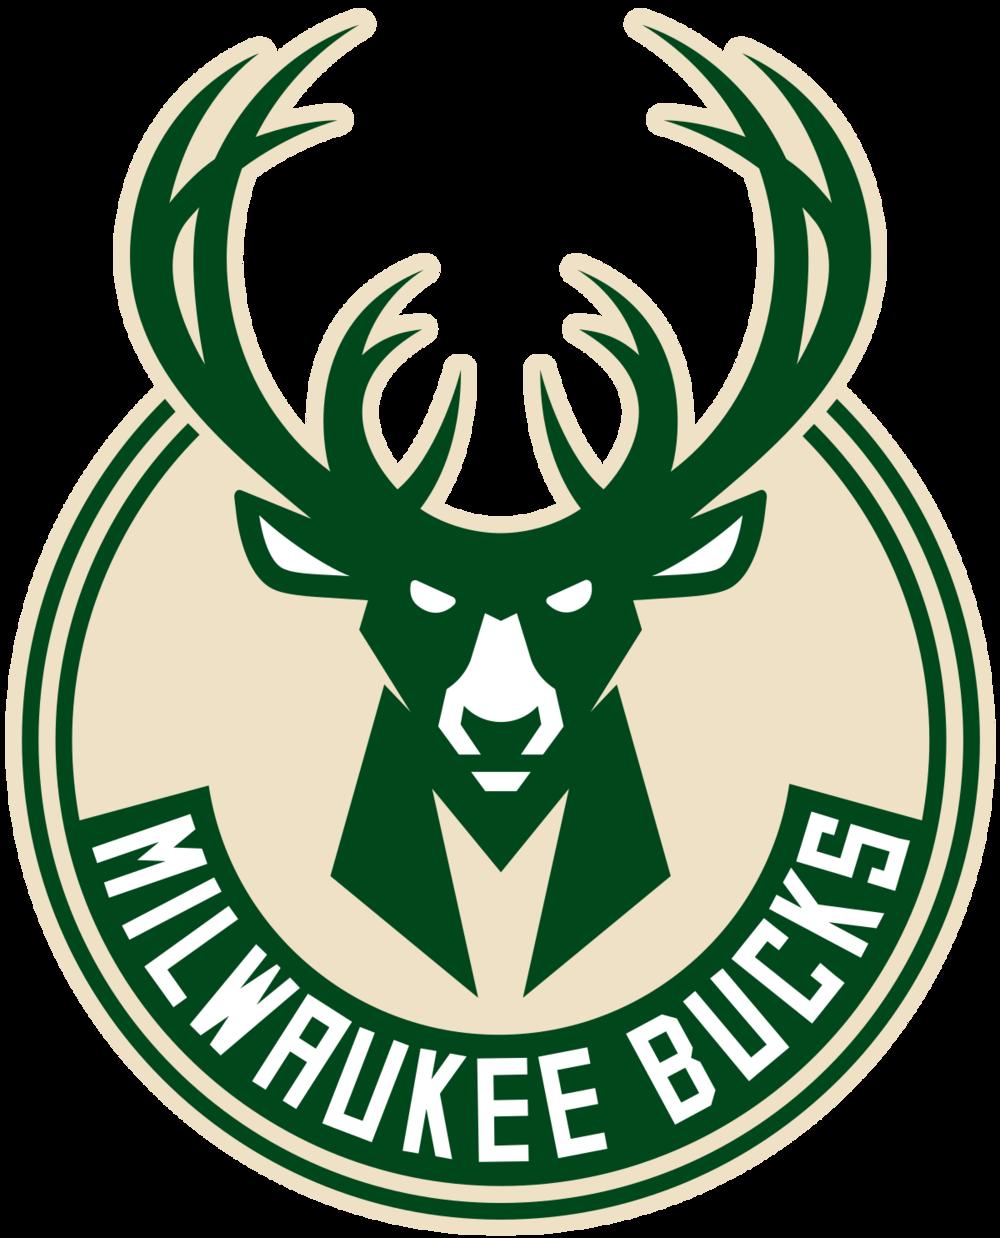 1200px-Milwaukee_Bucks_logo.png